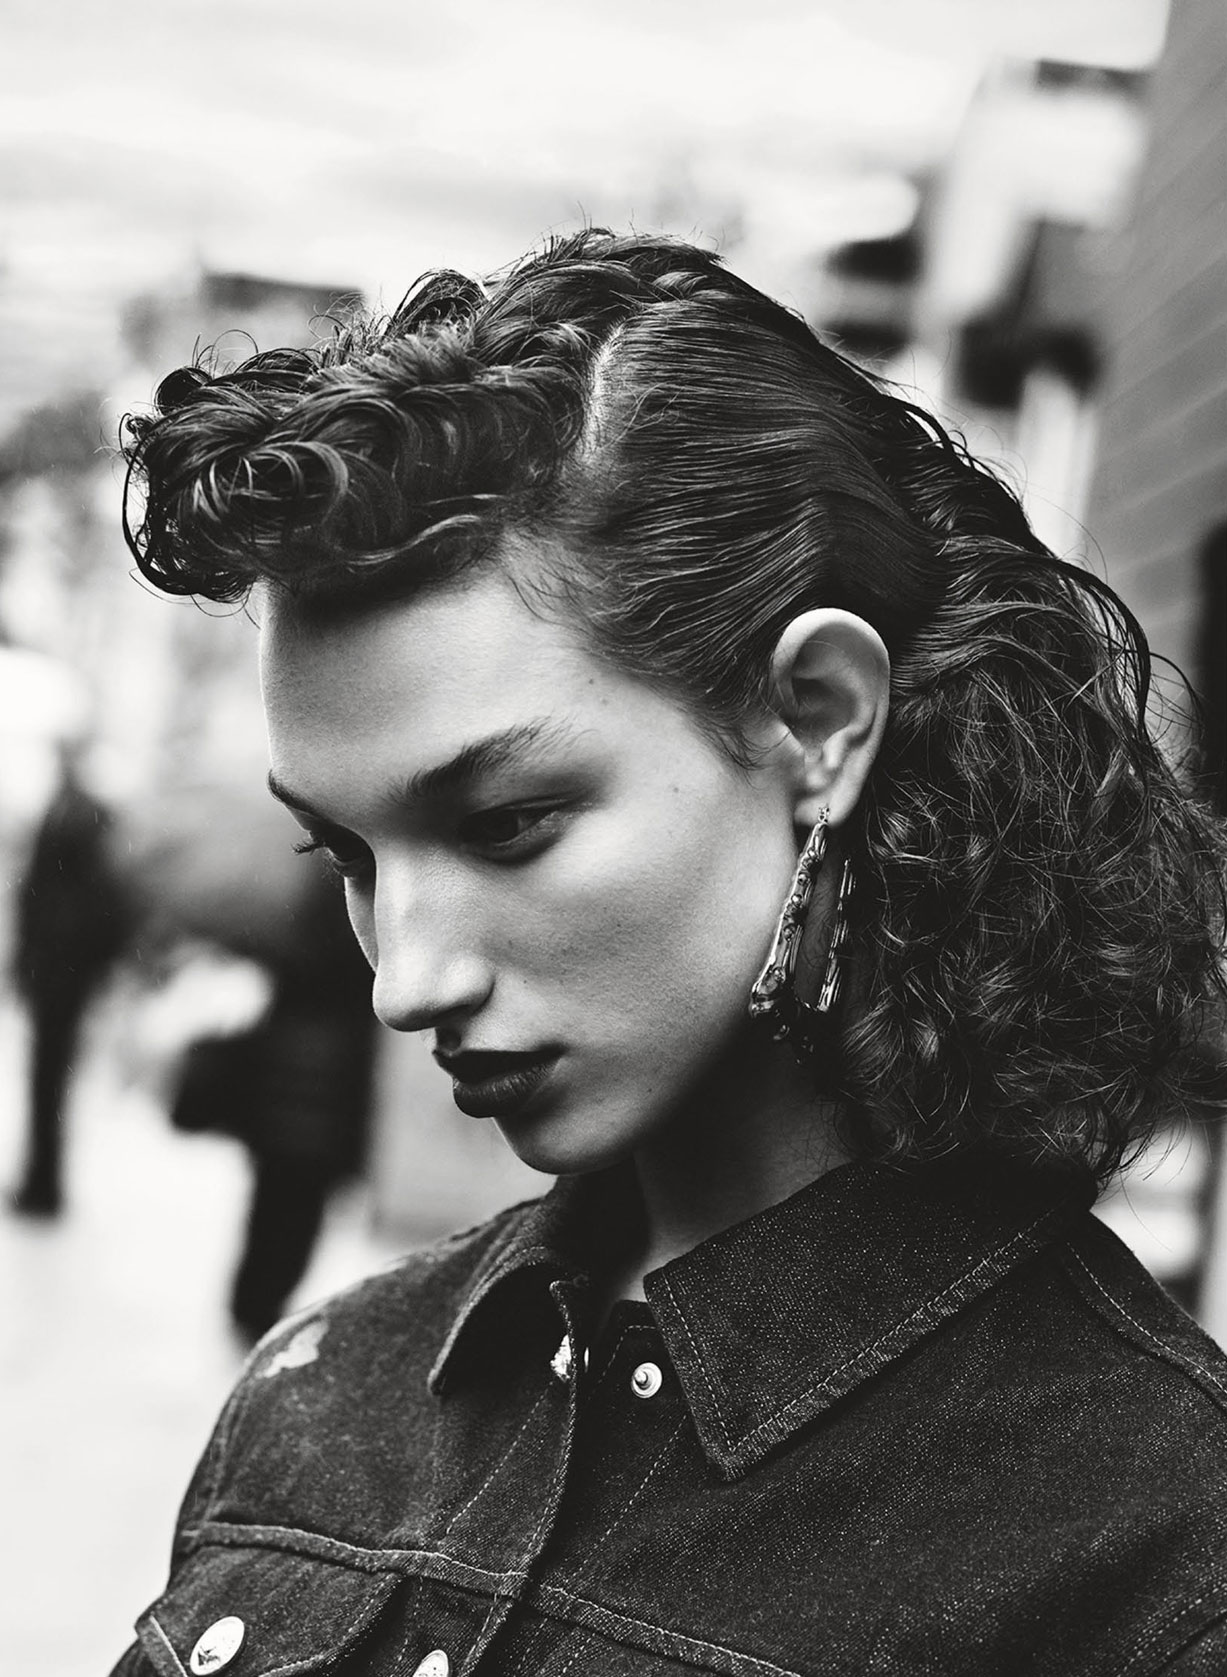 photo by Mert Alas and Marcus Piggott - W Magazine september 2017